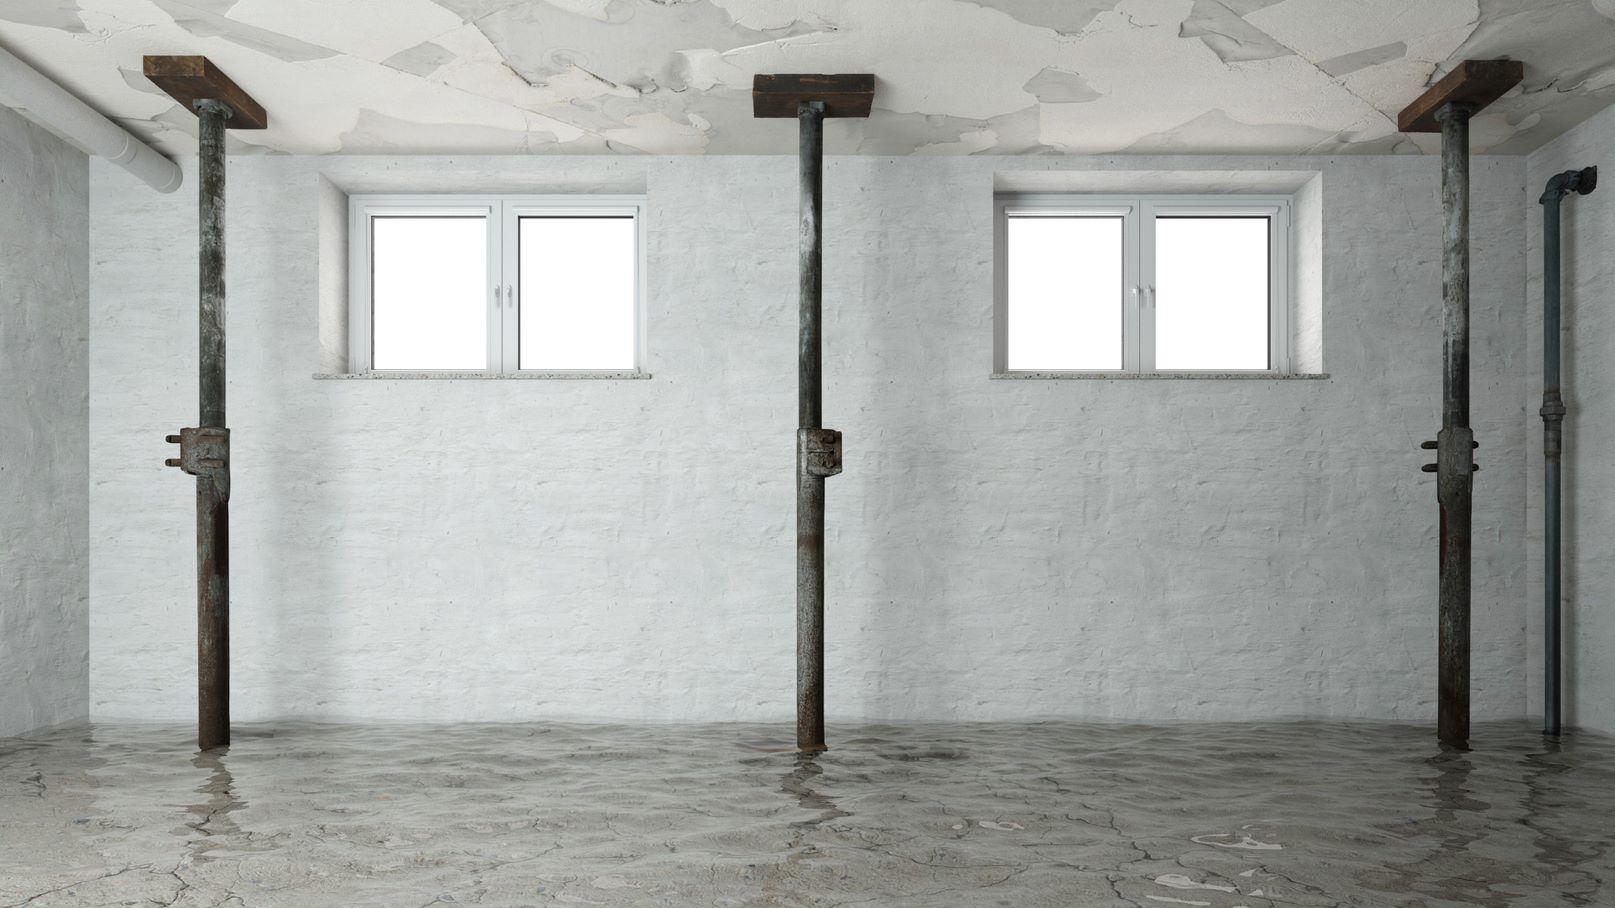 A damaged basement